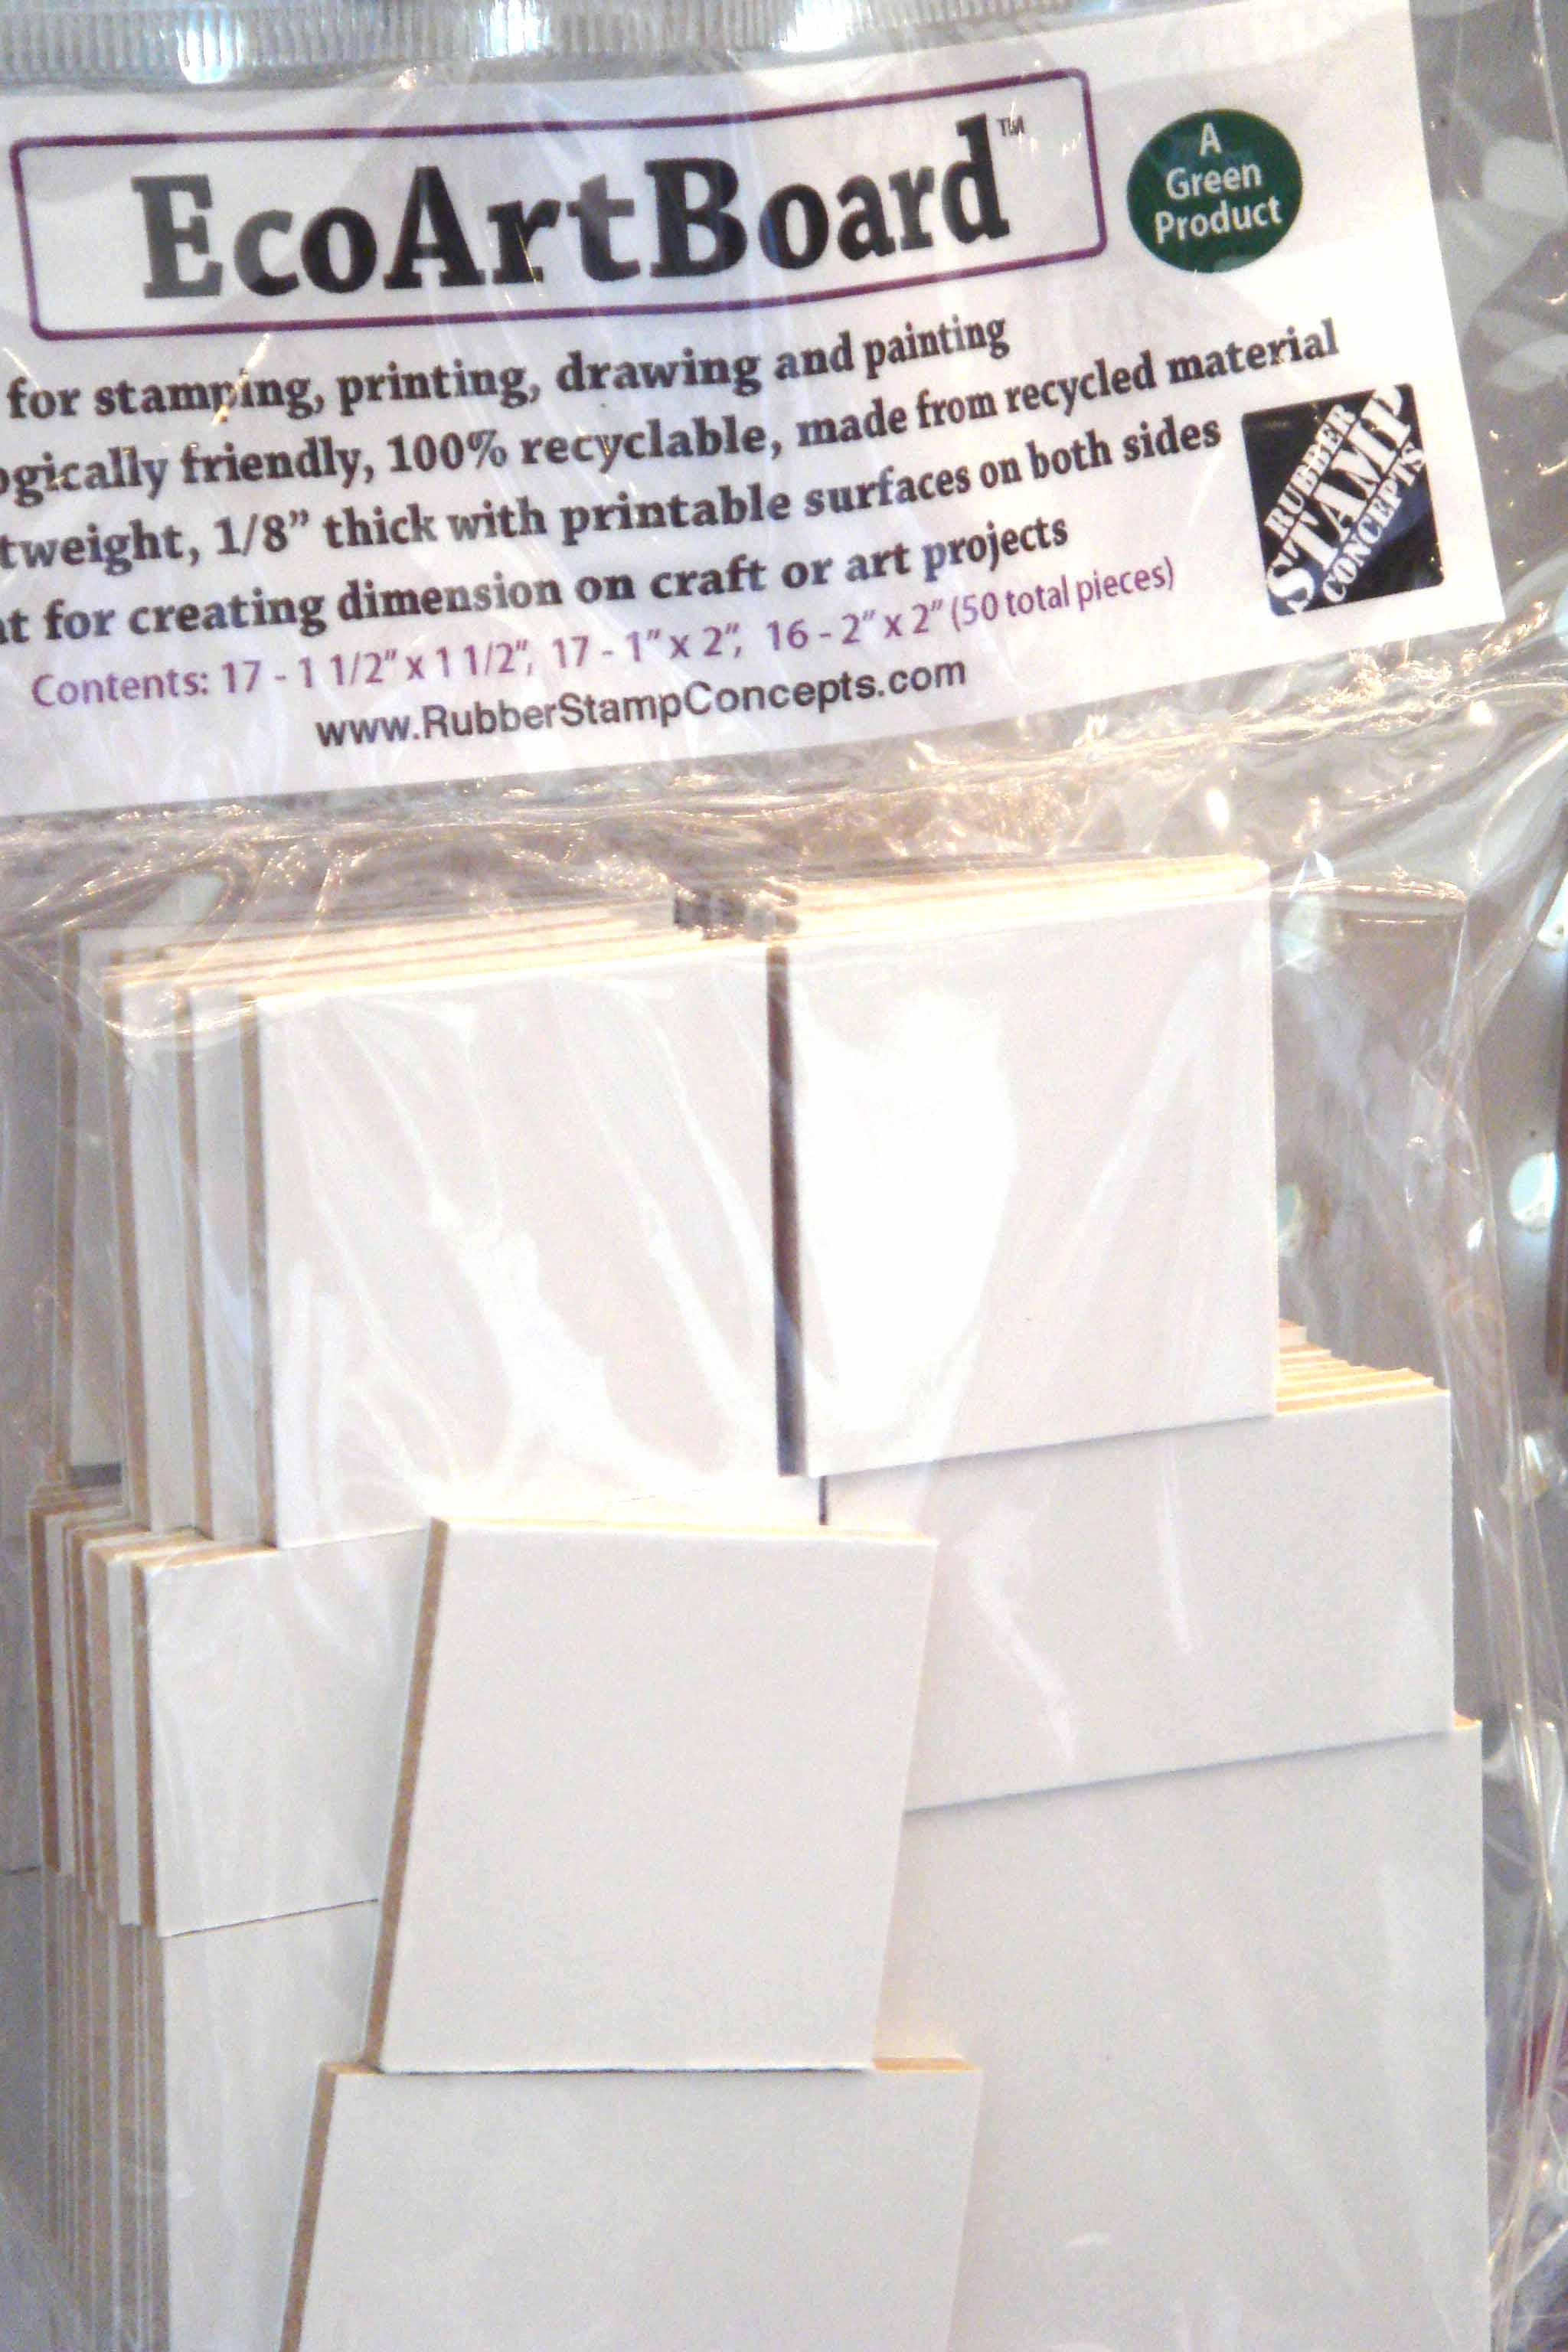 carson eco board package